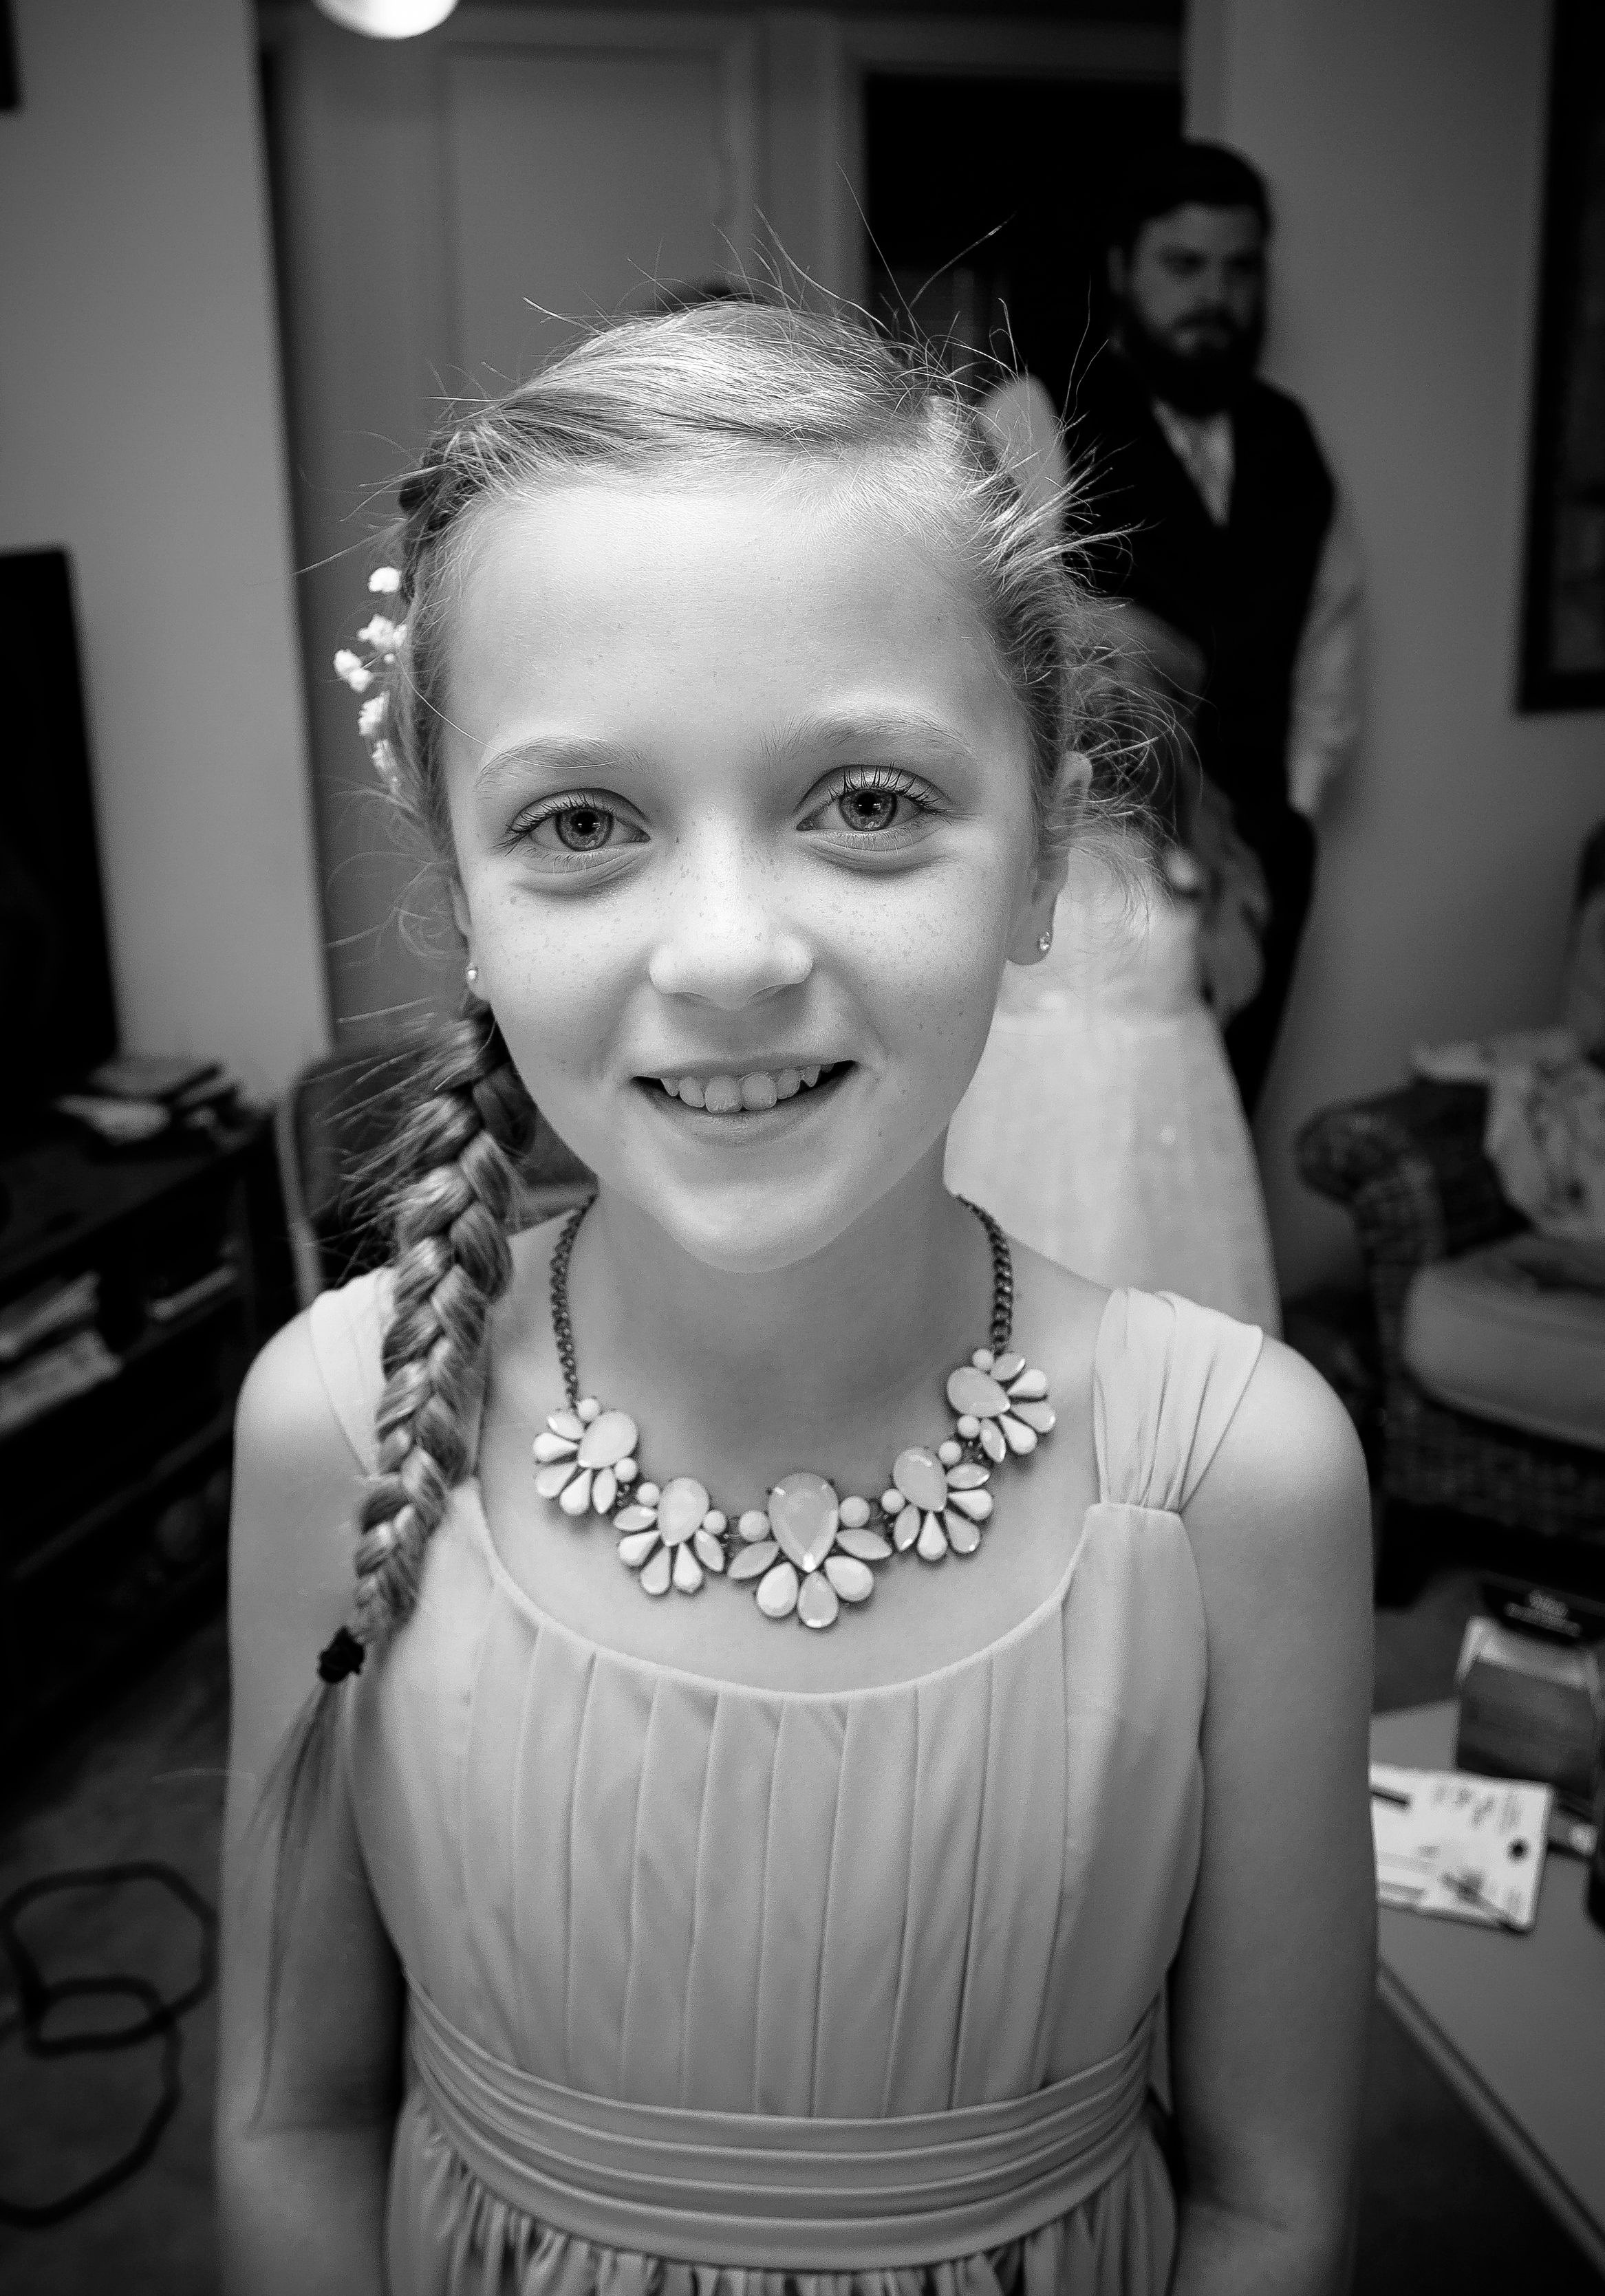 WeddingWebsite4.jpg